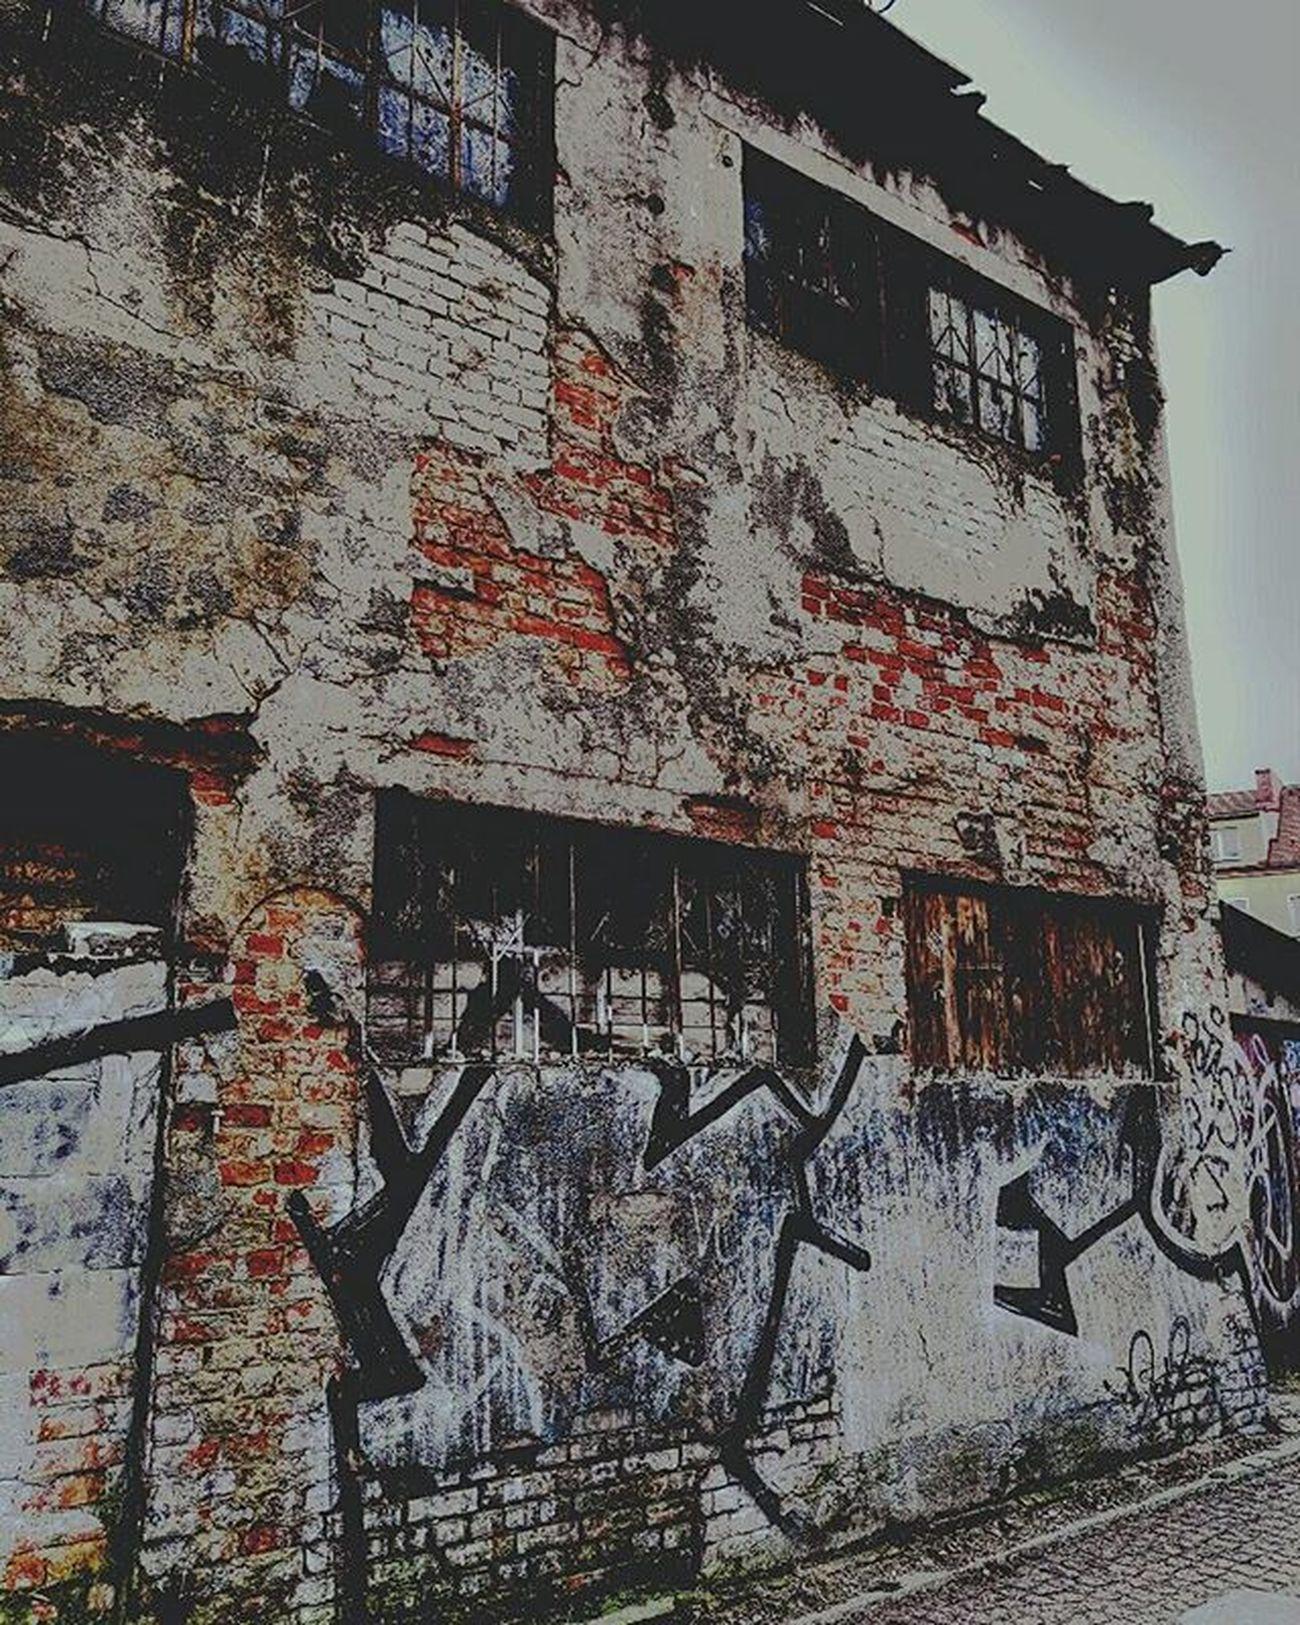 Architecture Slums Ruins Dark Textute Bulding Wall